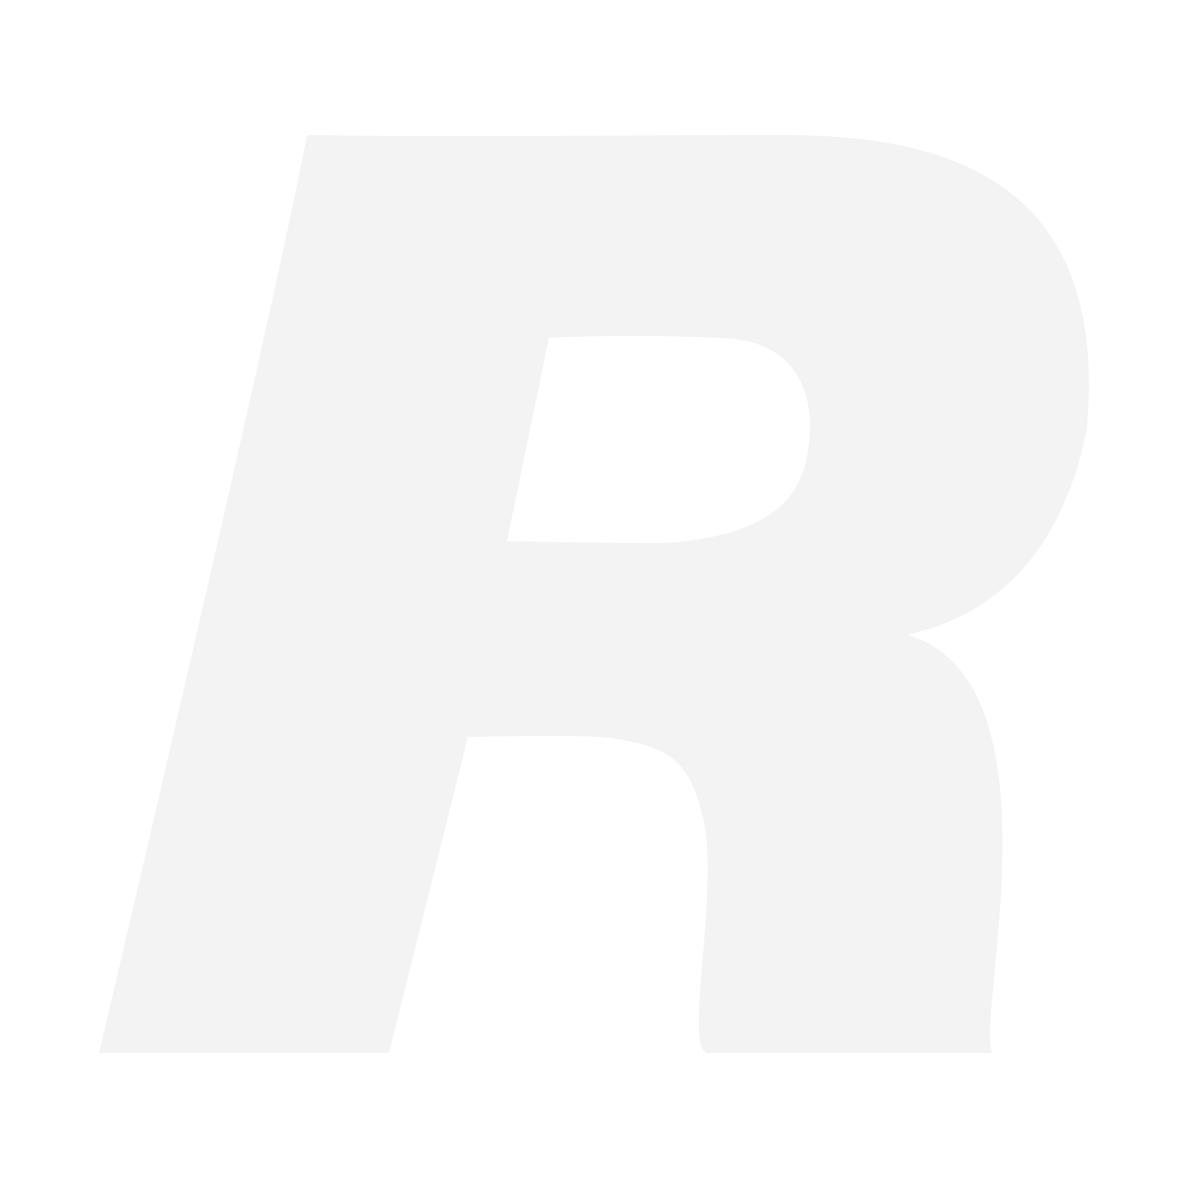 Sony A7 Mark III + Sigma 35mm f/1.4 Art DG HSM